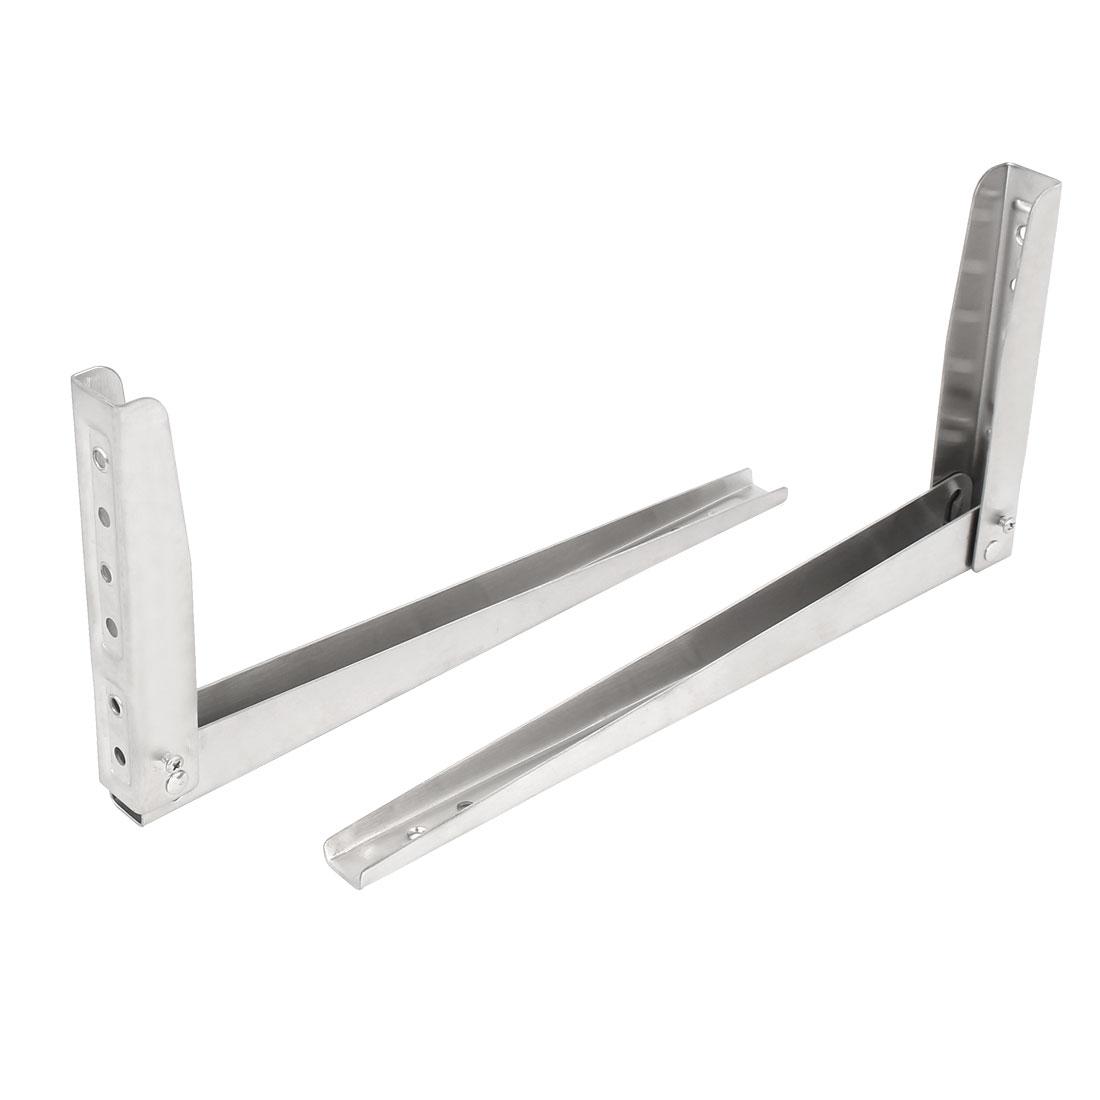 "12"" Stainless Steel Folding Wall Mounted Shelf Bracket Brace Sliver Tone 2pcs"